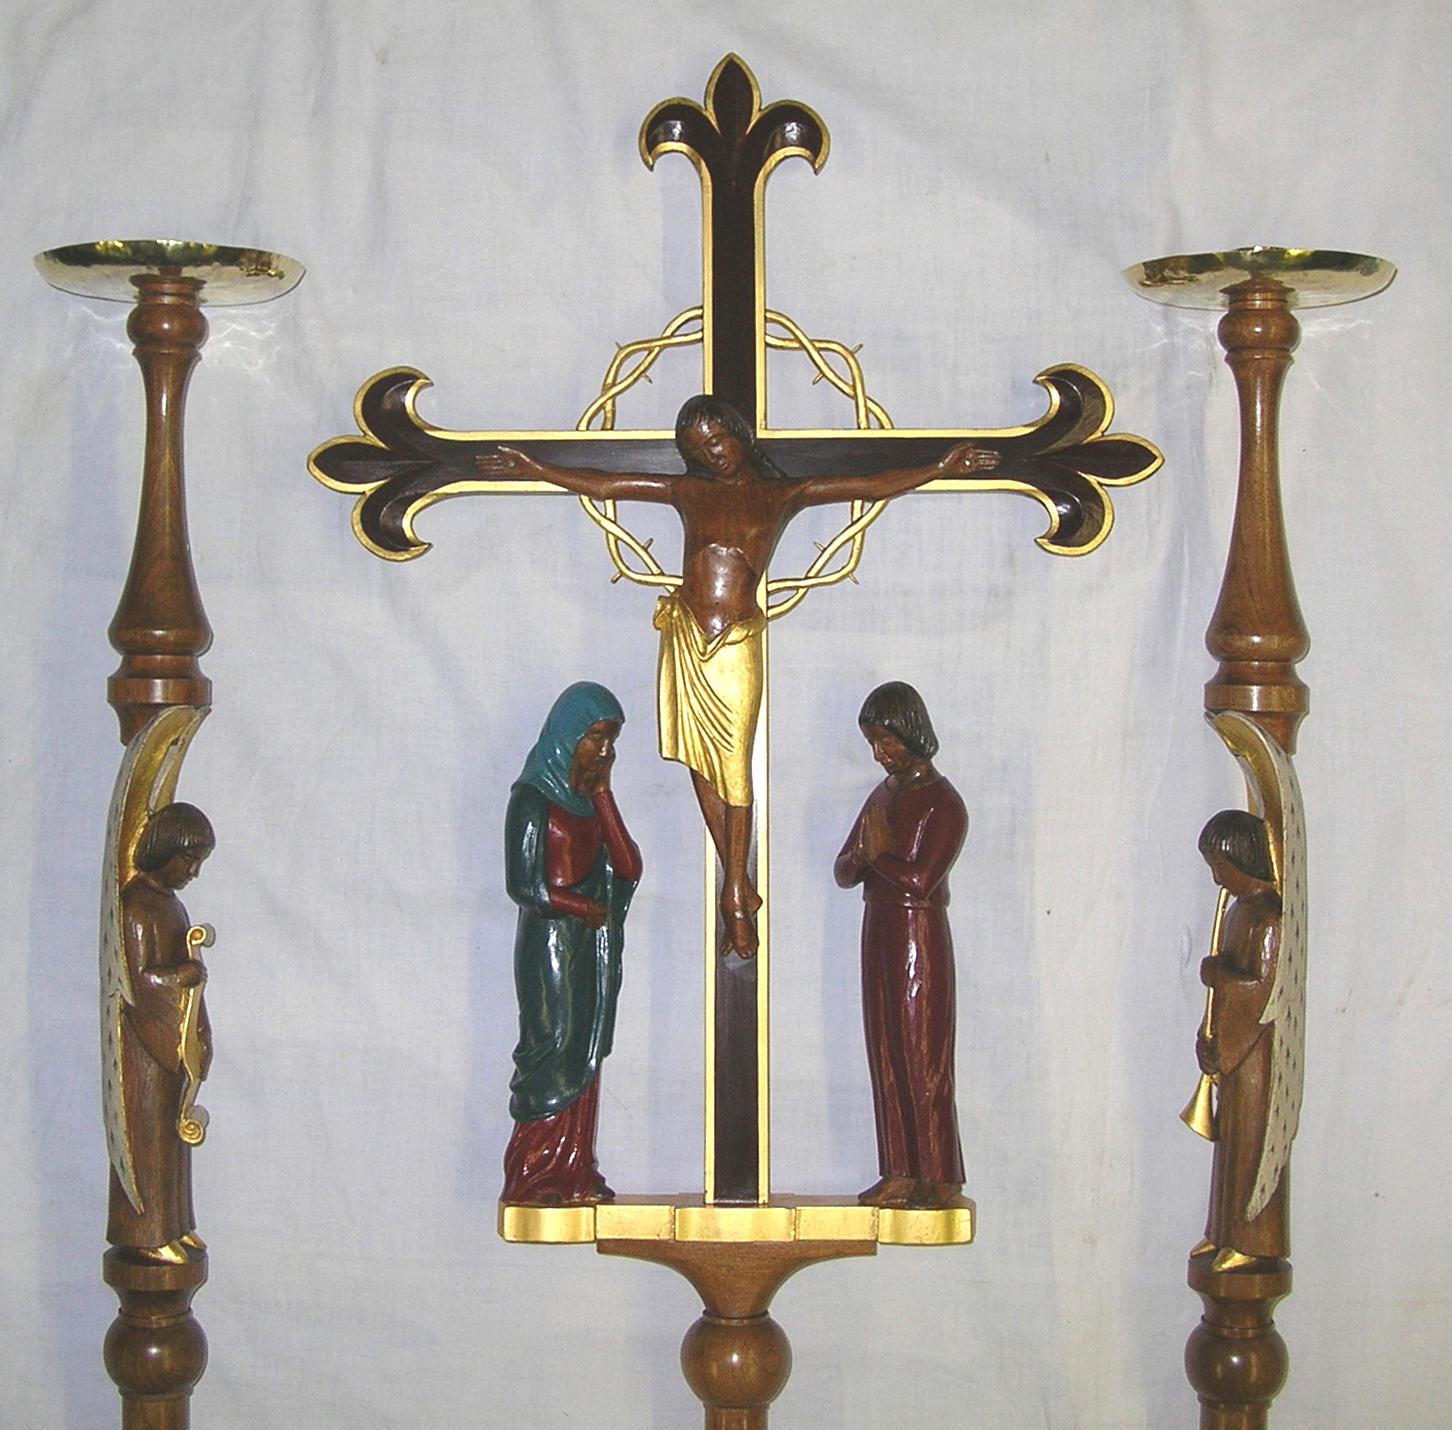 Cross and Candlesticks